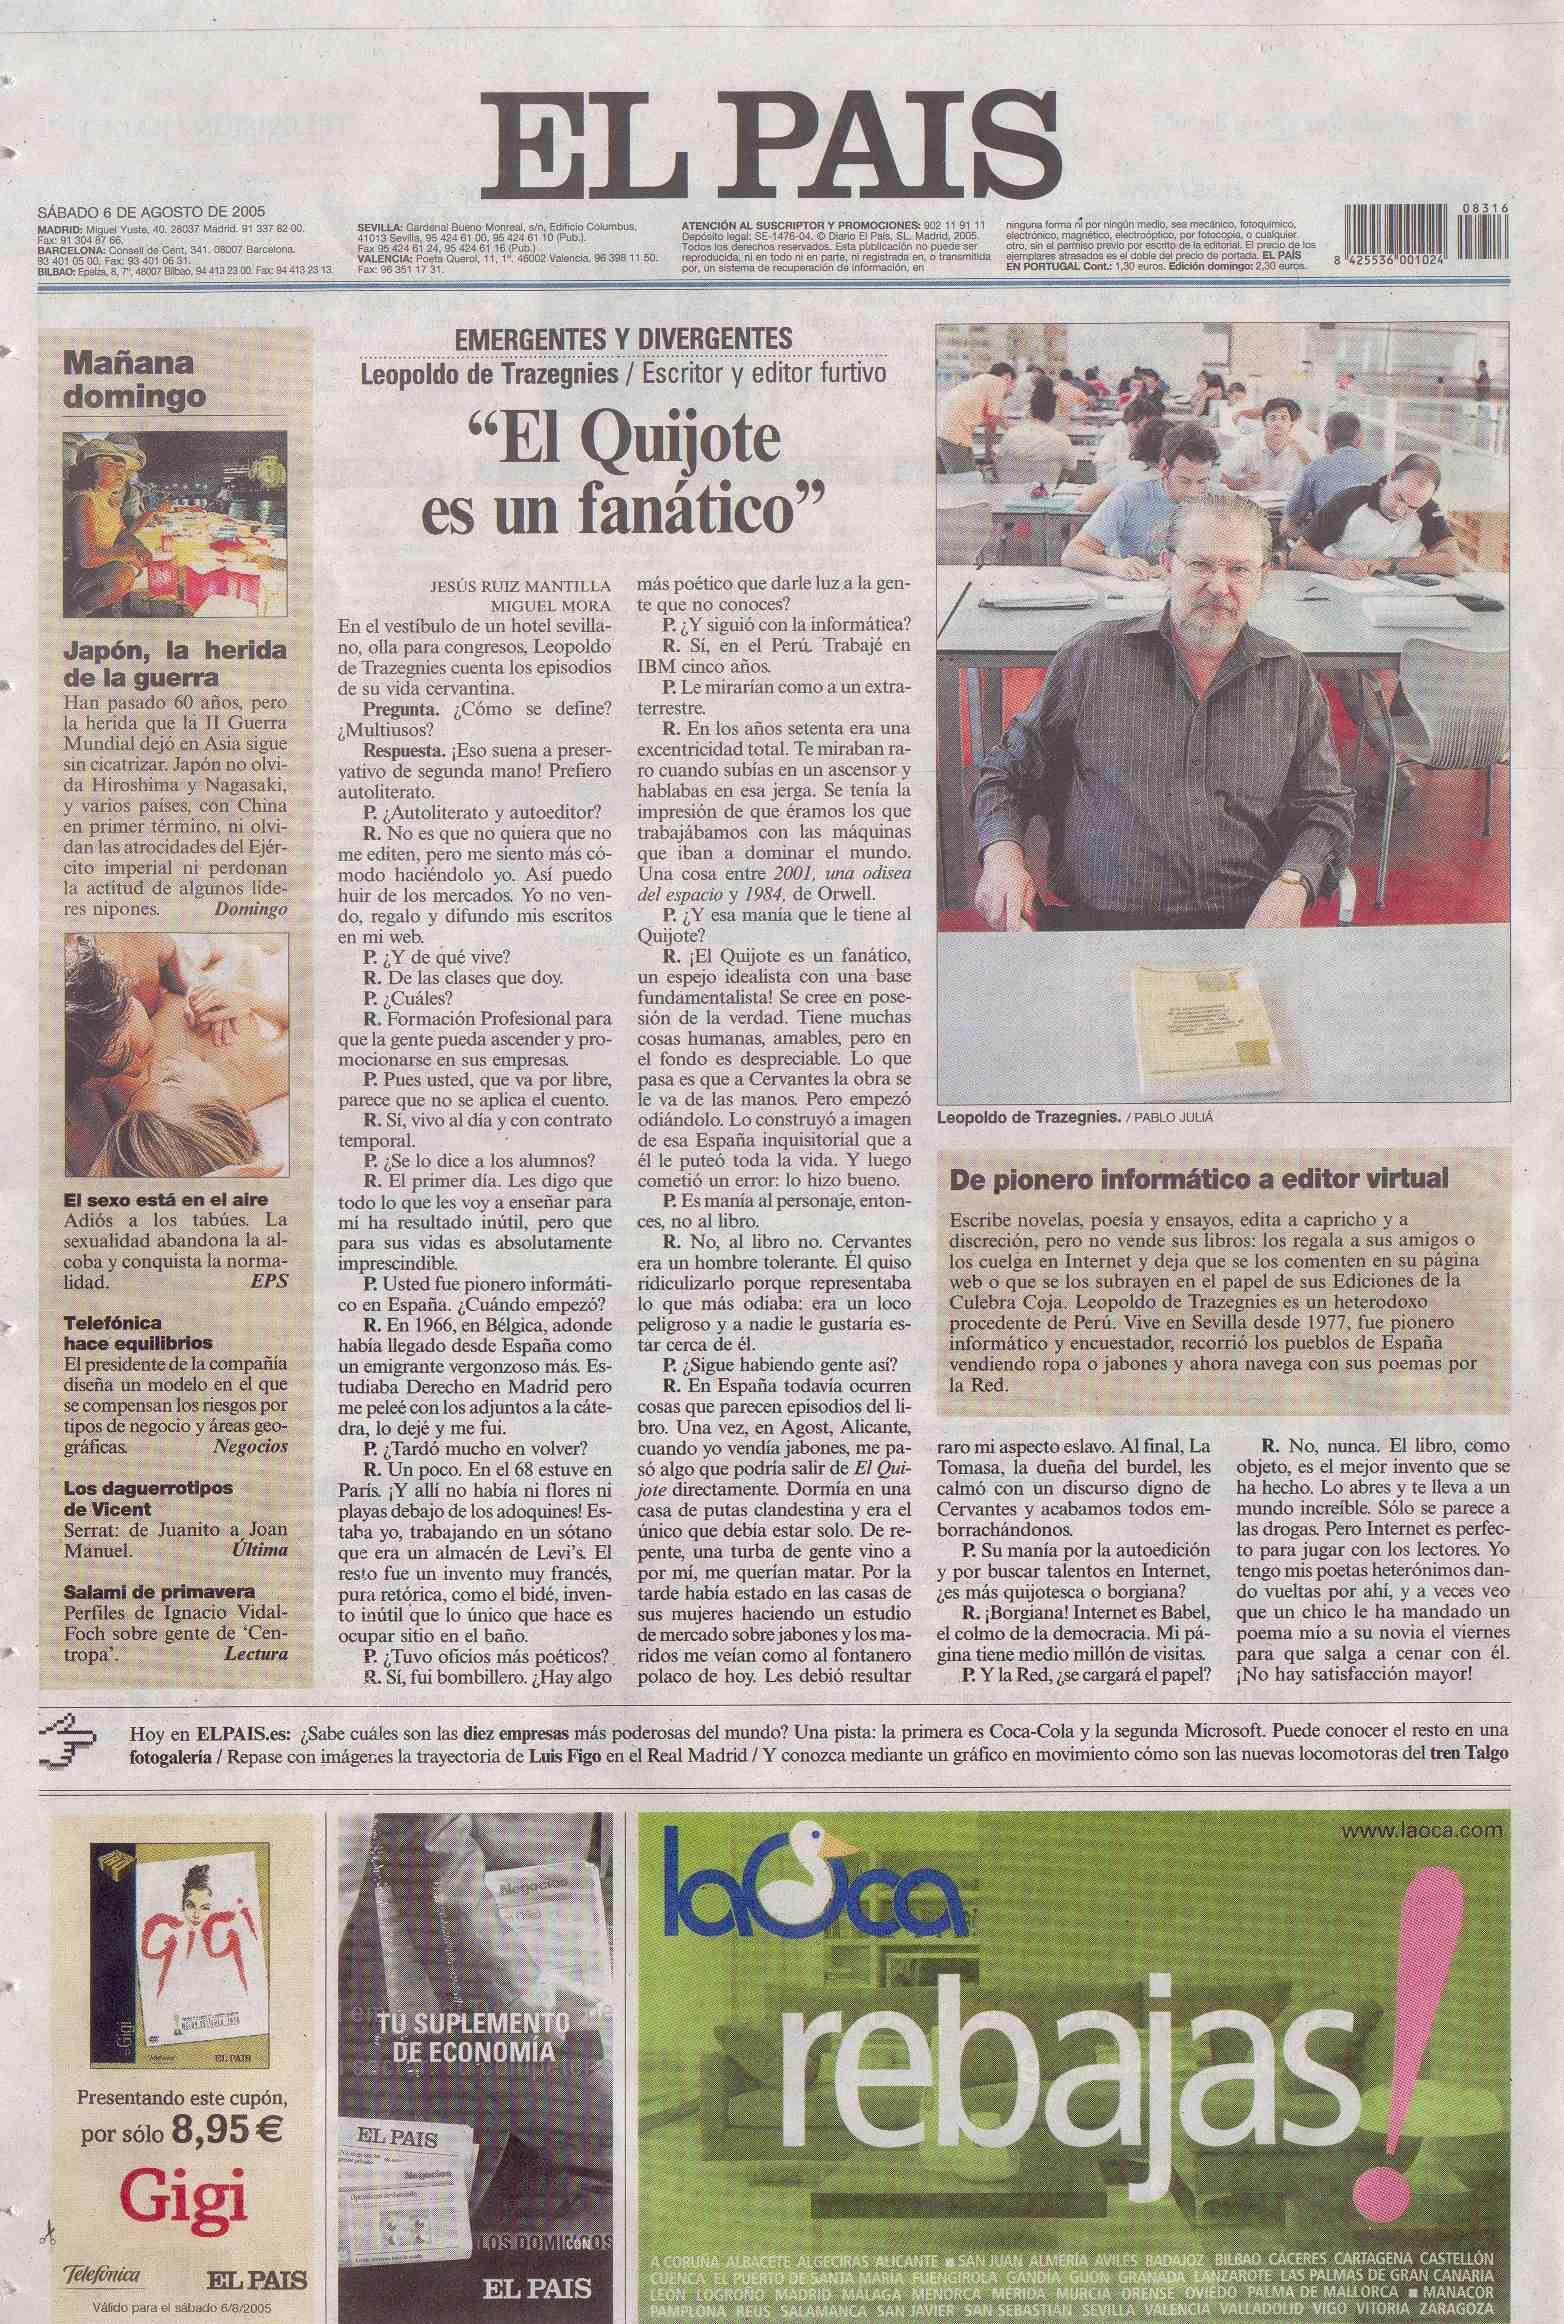 El Pais, sábado 6/8/2005